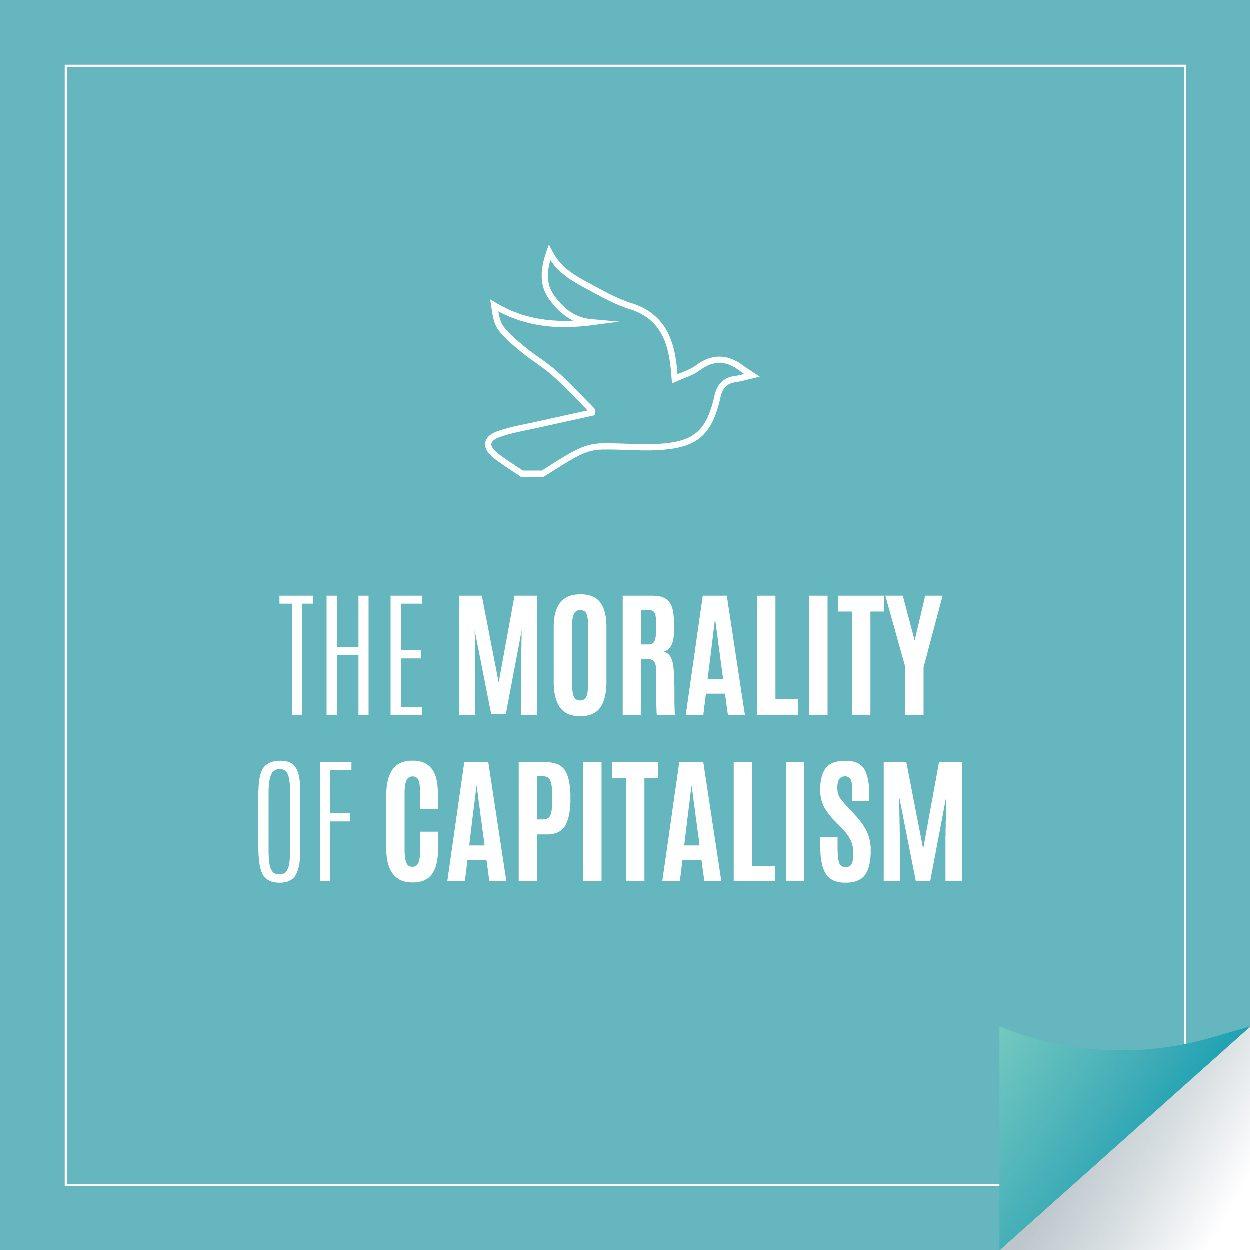 literature_morality